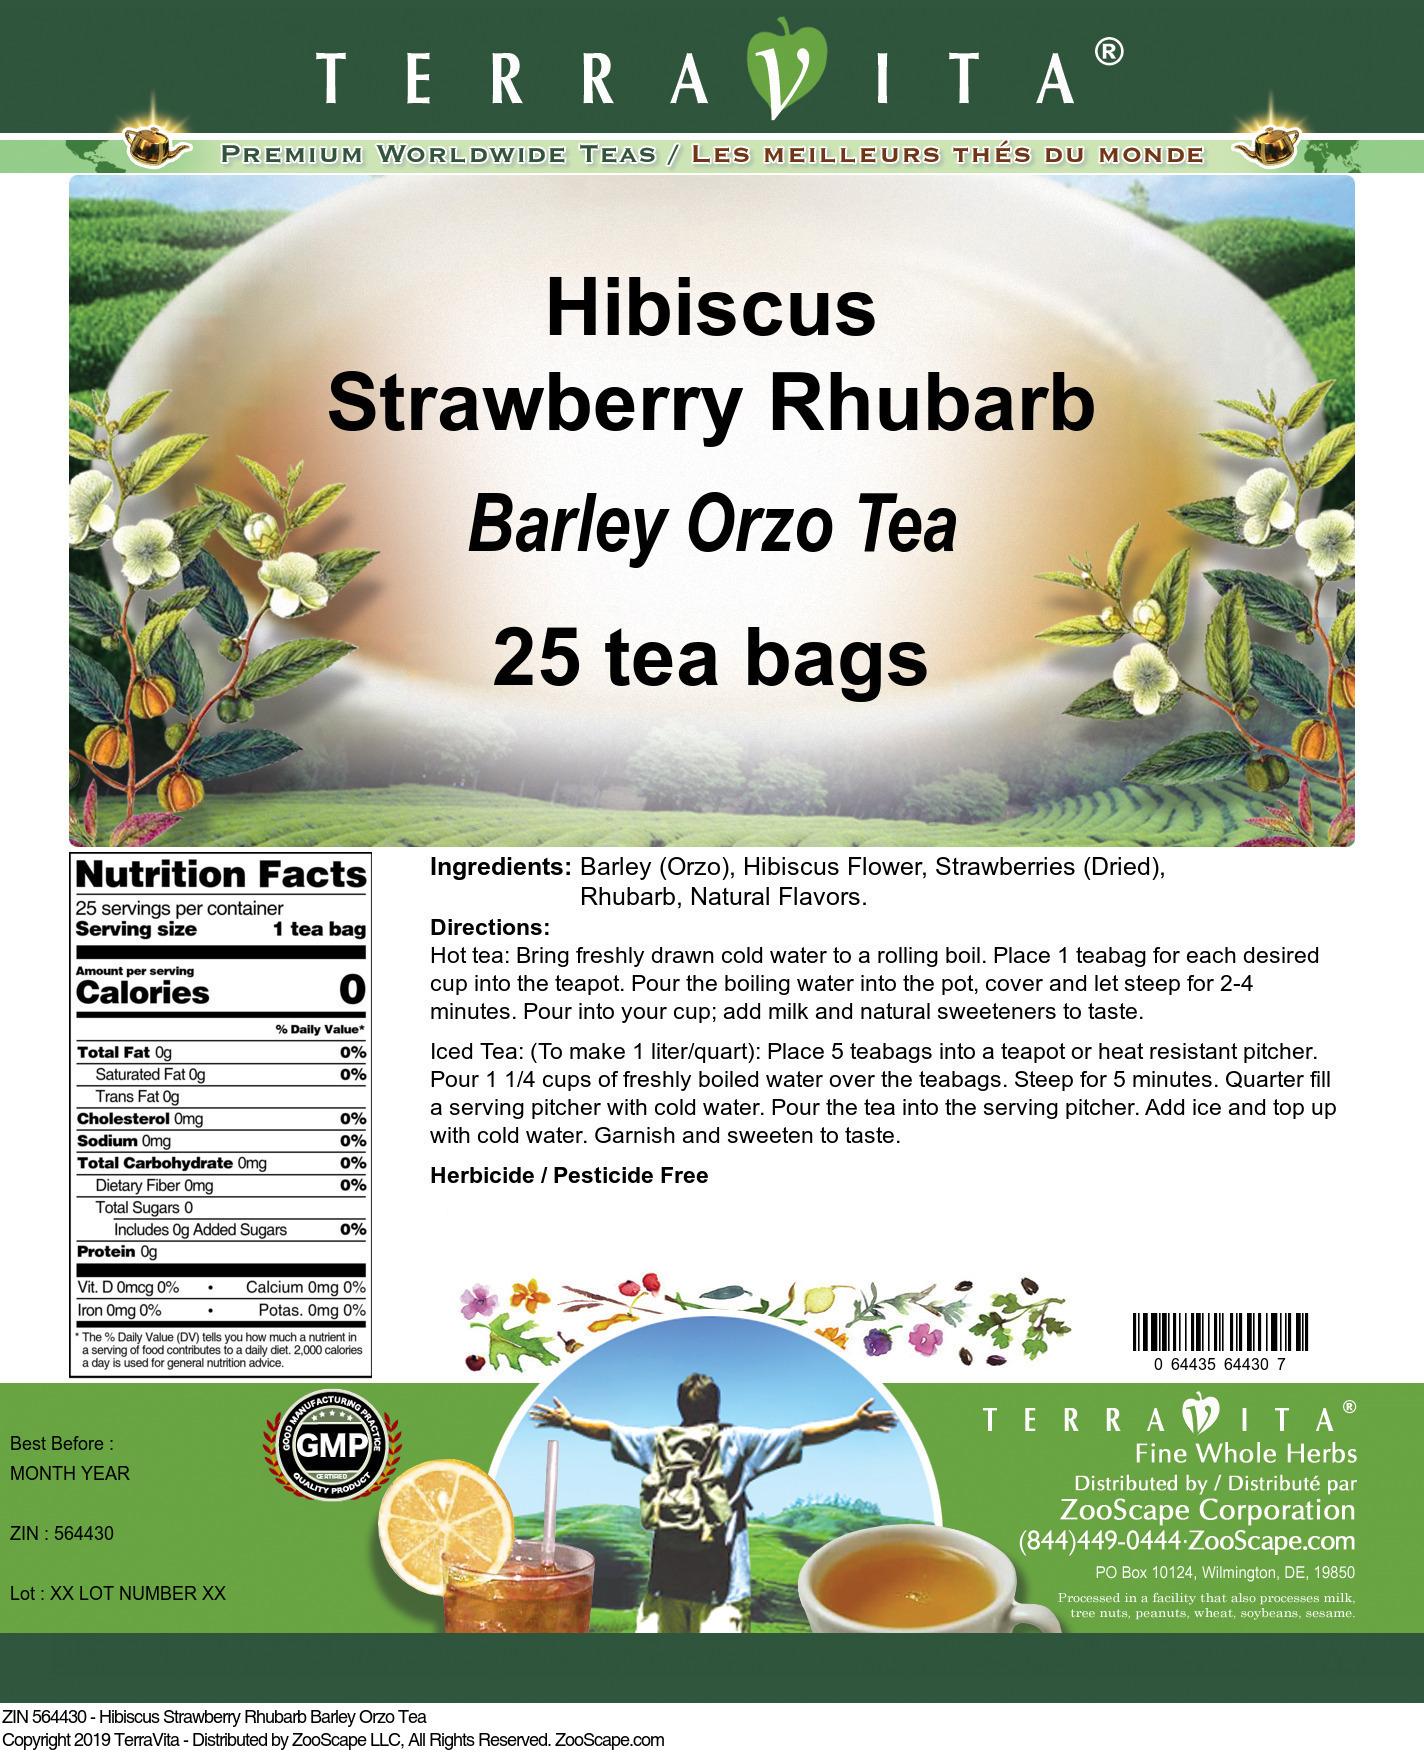 Hibiscus Strawberry Rhubarb Barley Orzo Tea